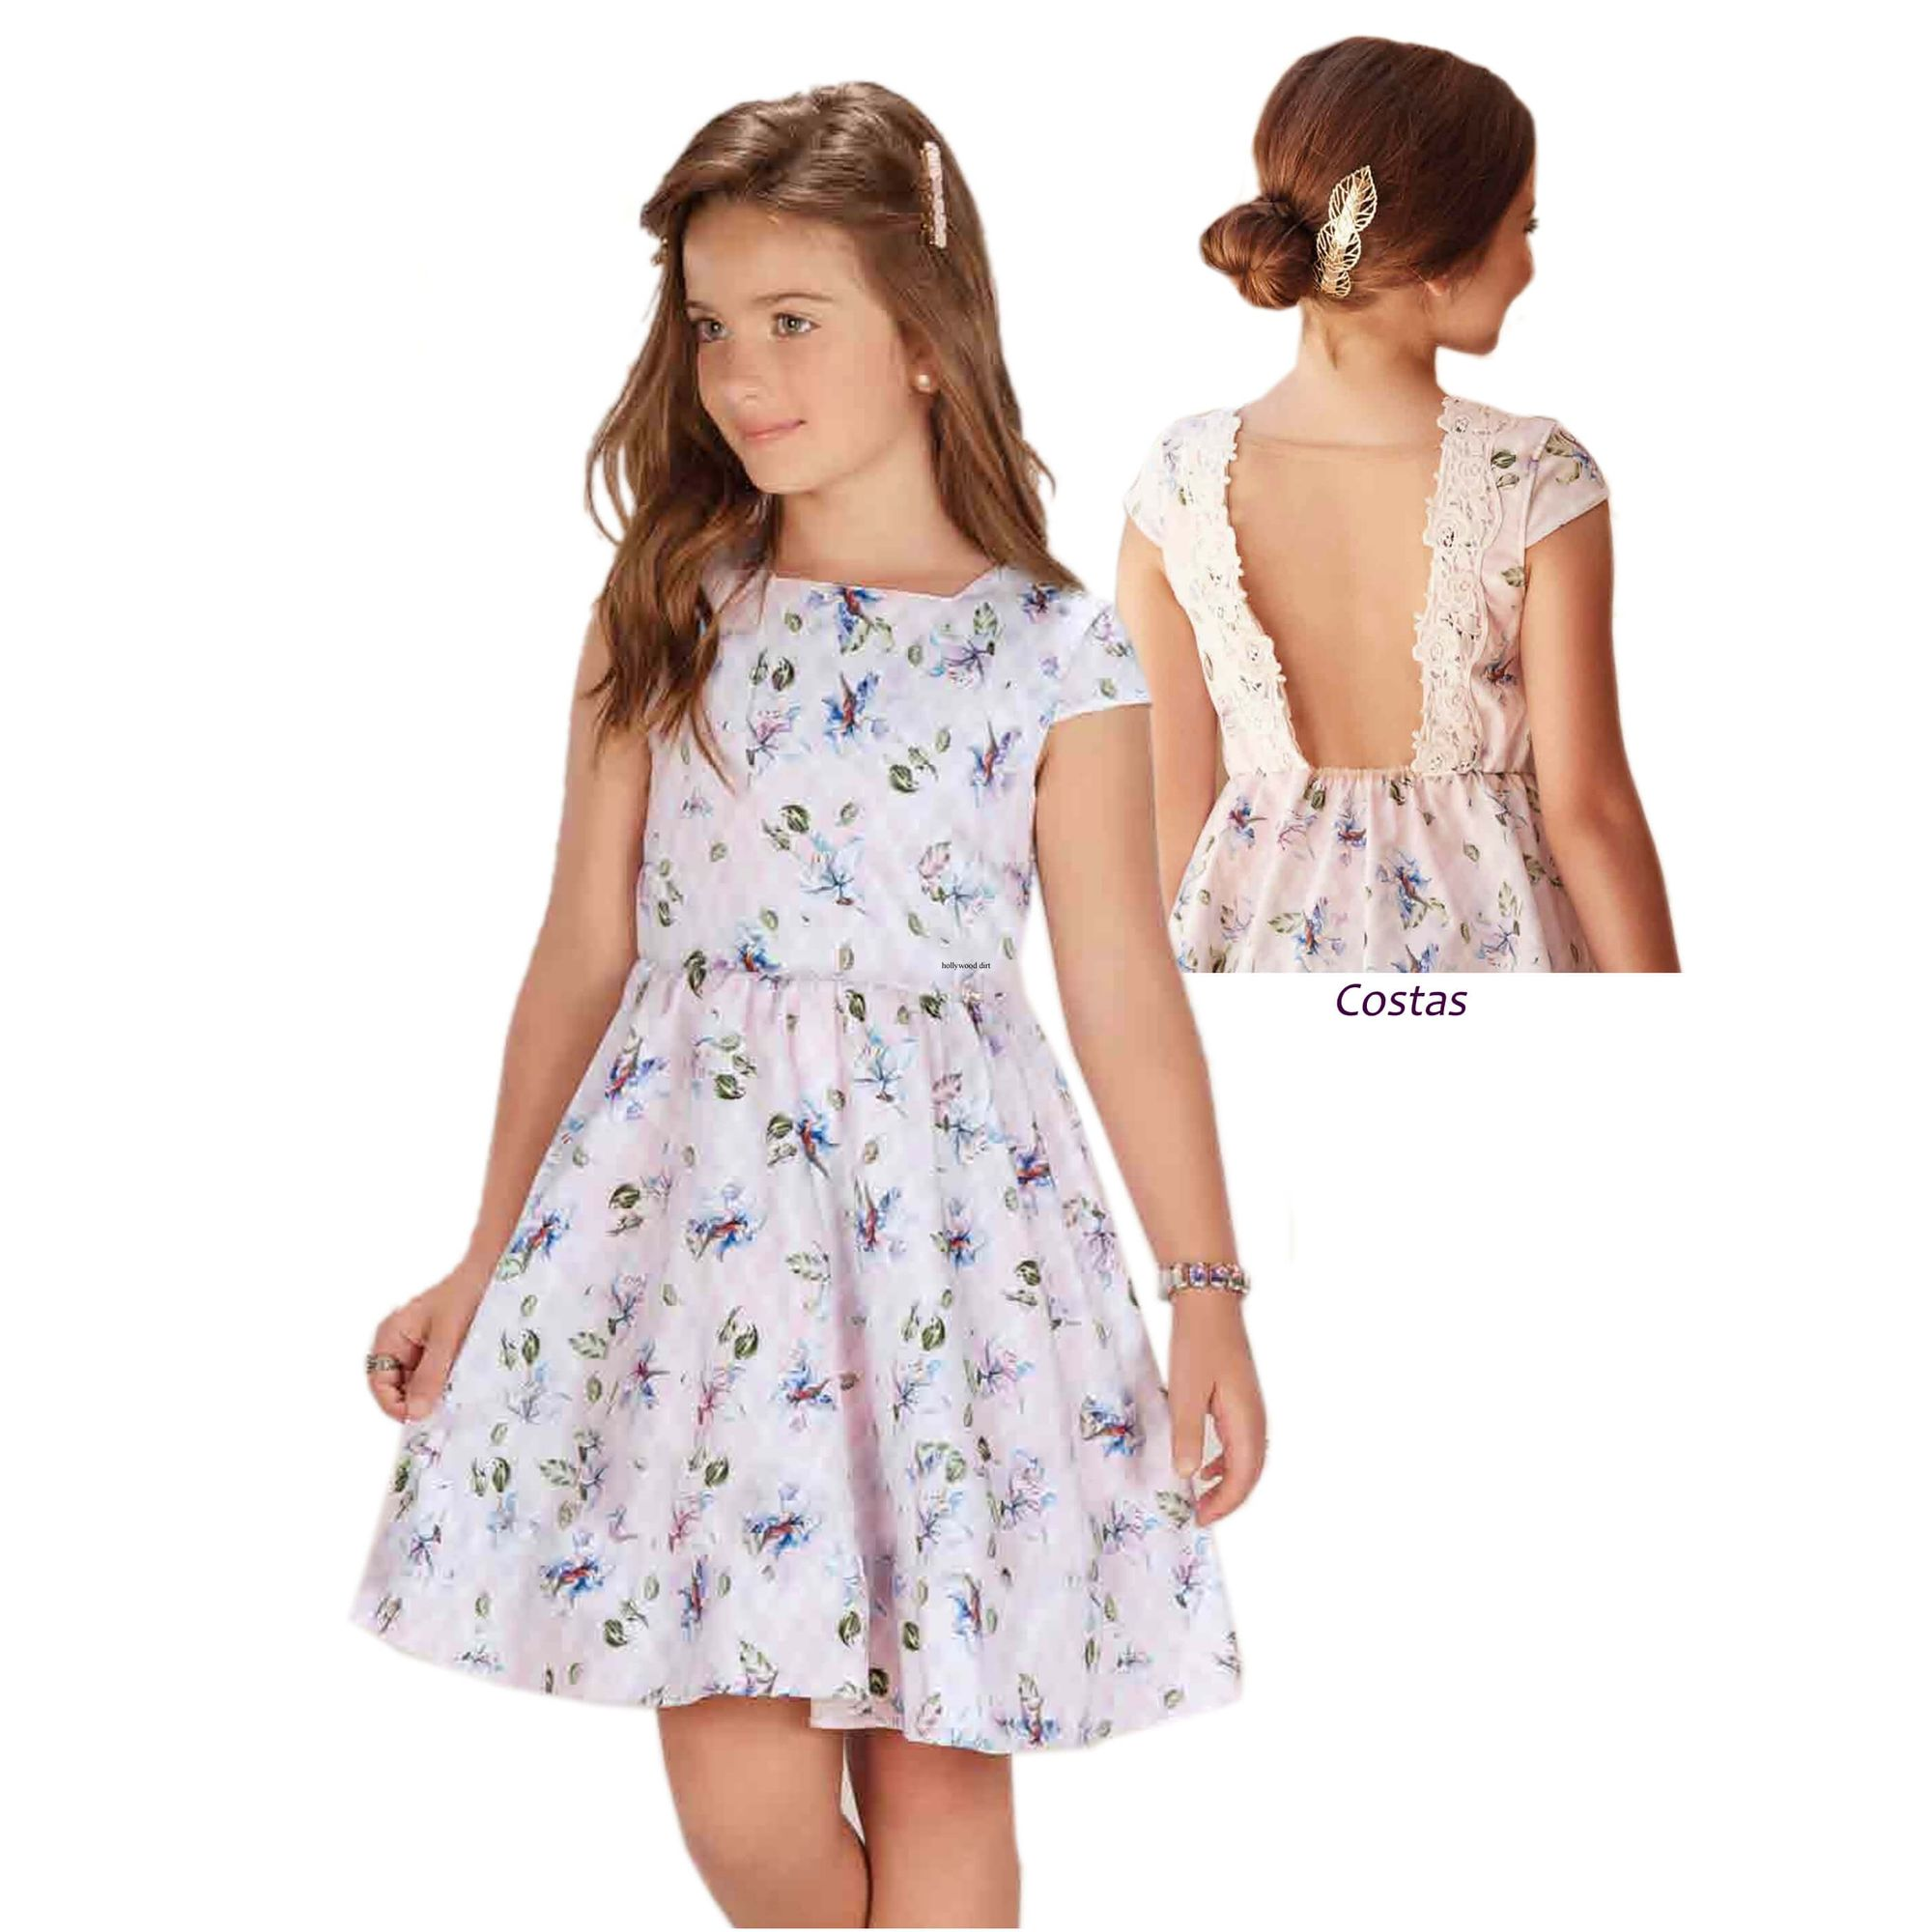 7e35ef2aae9b Vestido Infantil Cetim Lilás e Decote nas Costas com Tule - Infanti